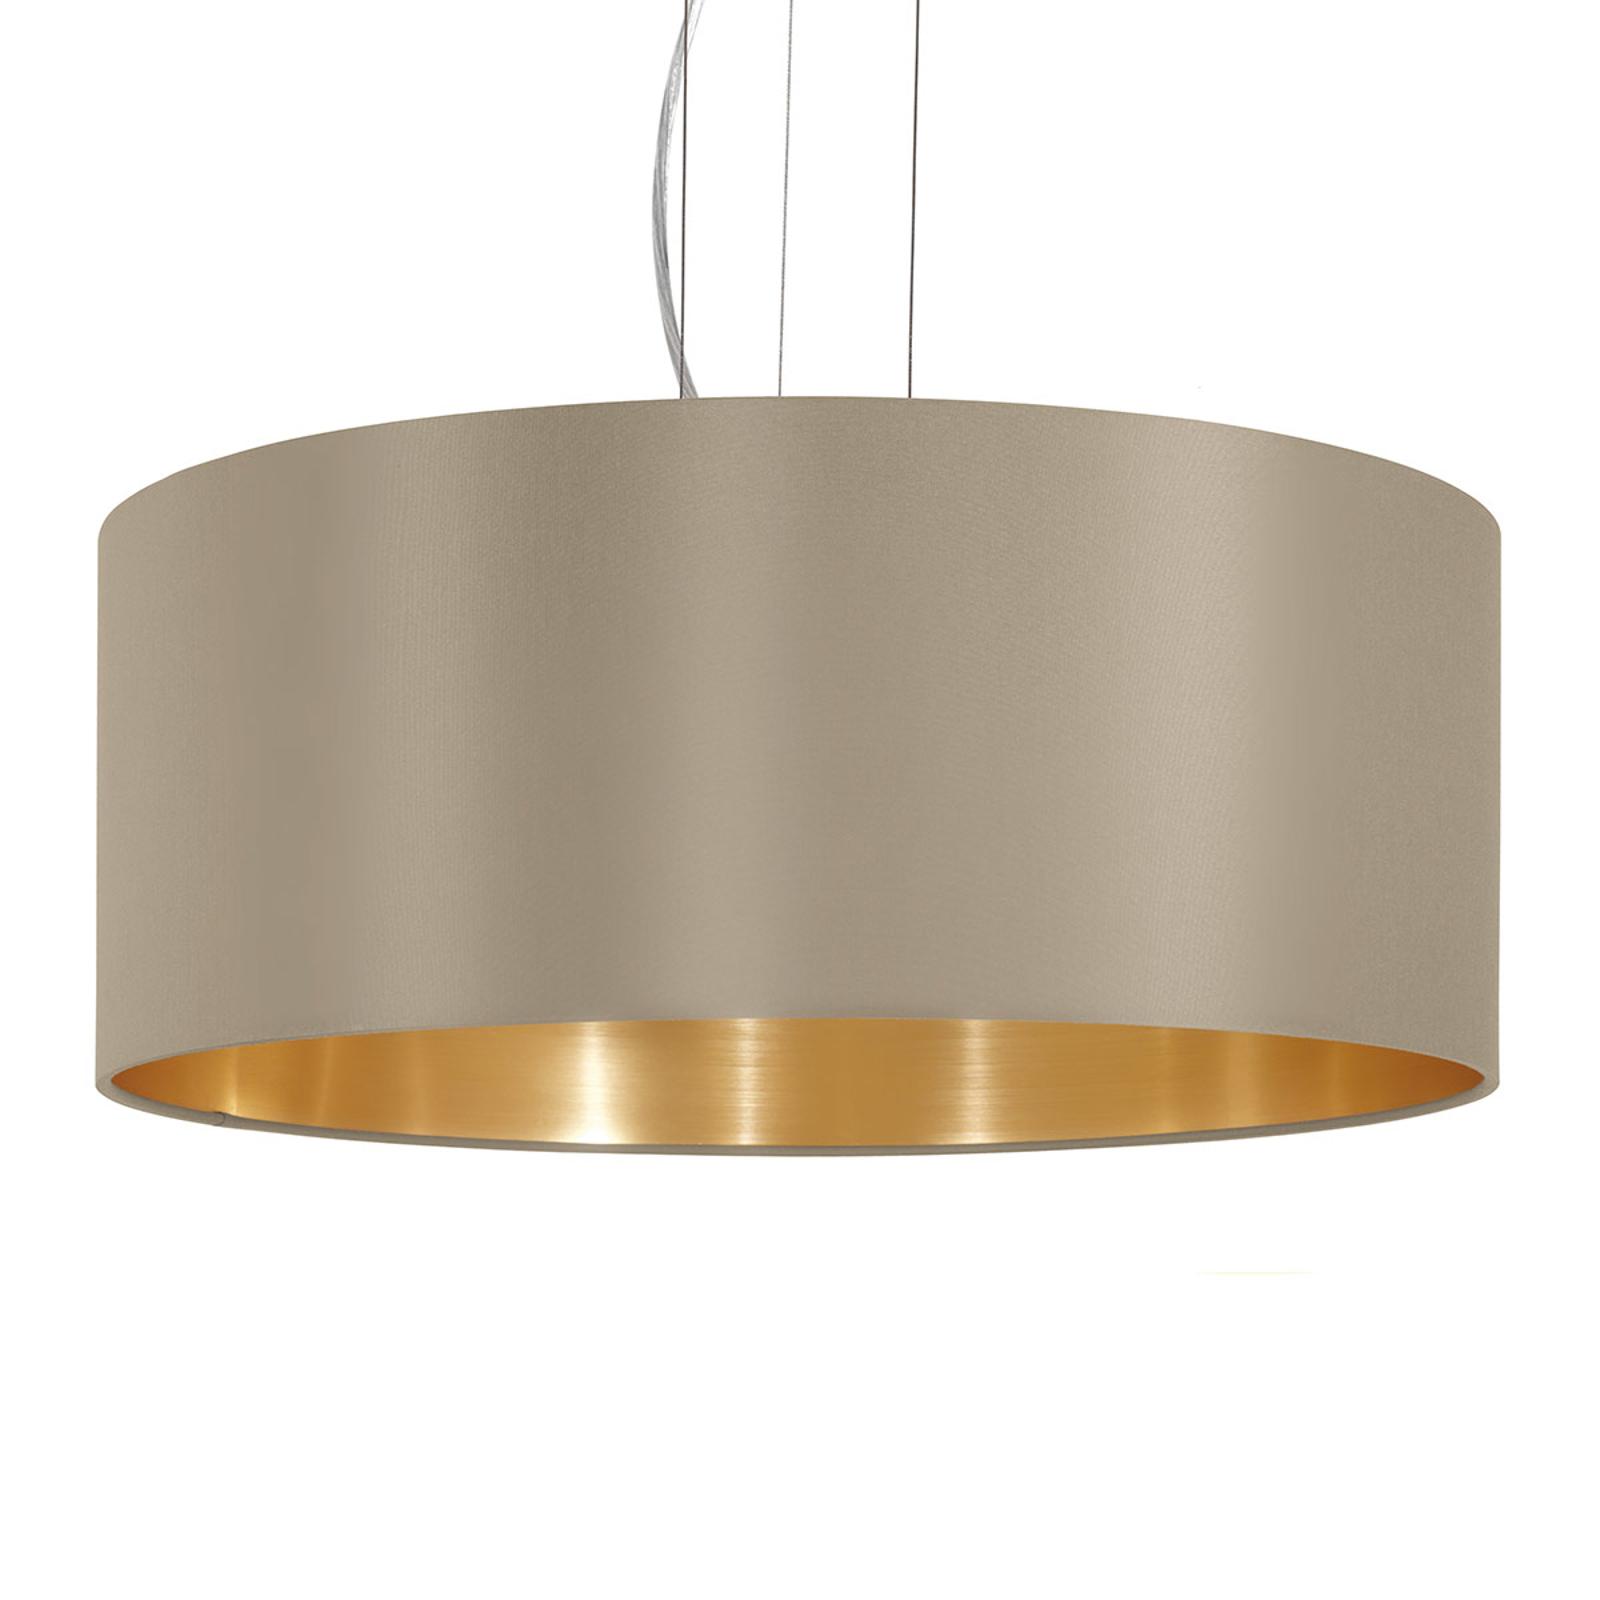 Lámpara colgante Maserlo redonda, marrón-dorado